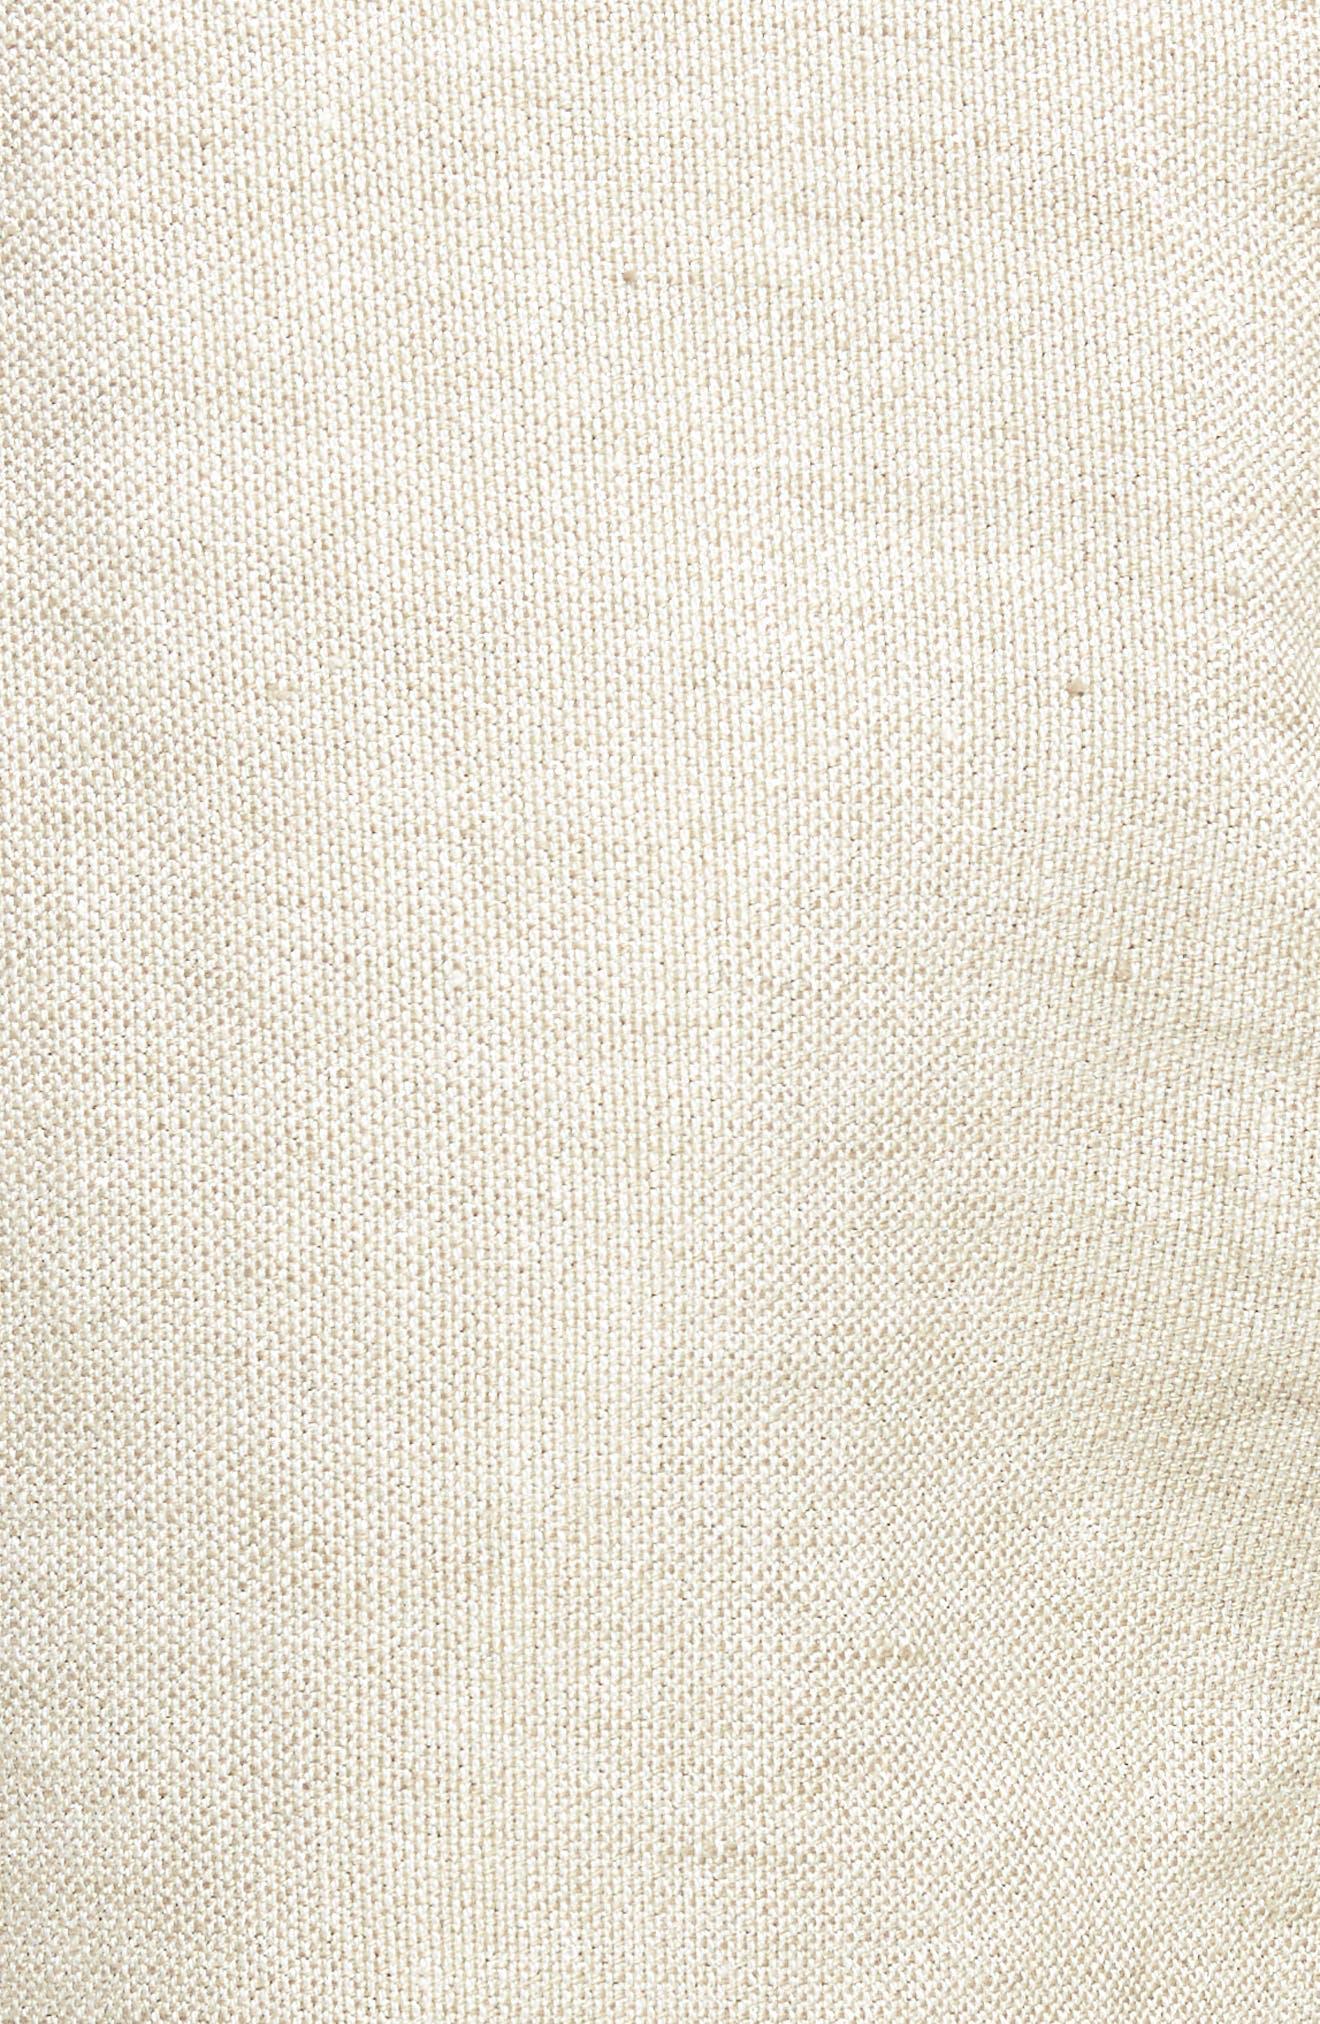 Organic Linen Blend Walking Shorts,                             Alternate thumbnail 5, color,                             257